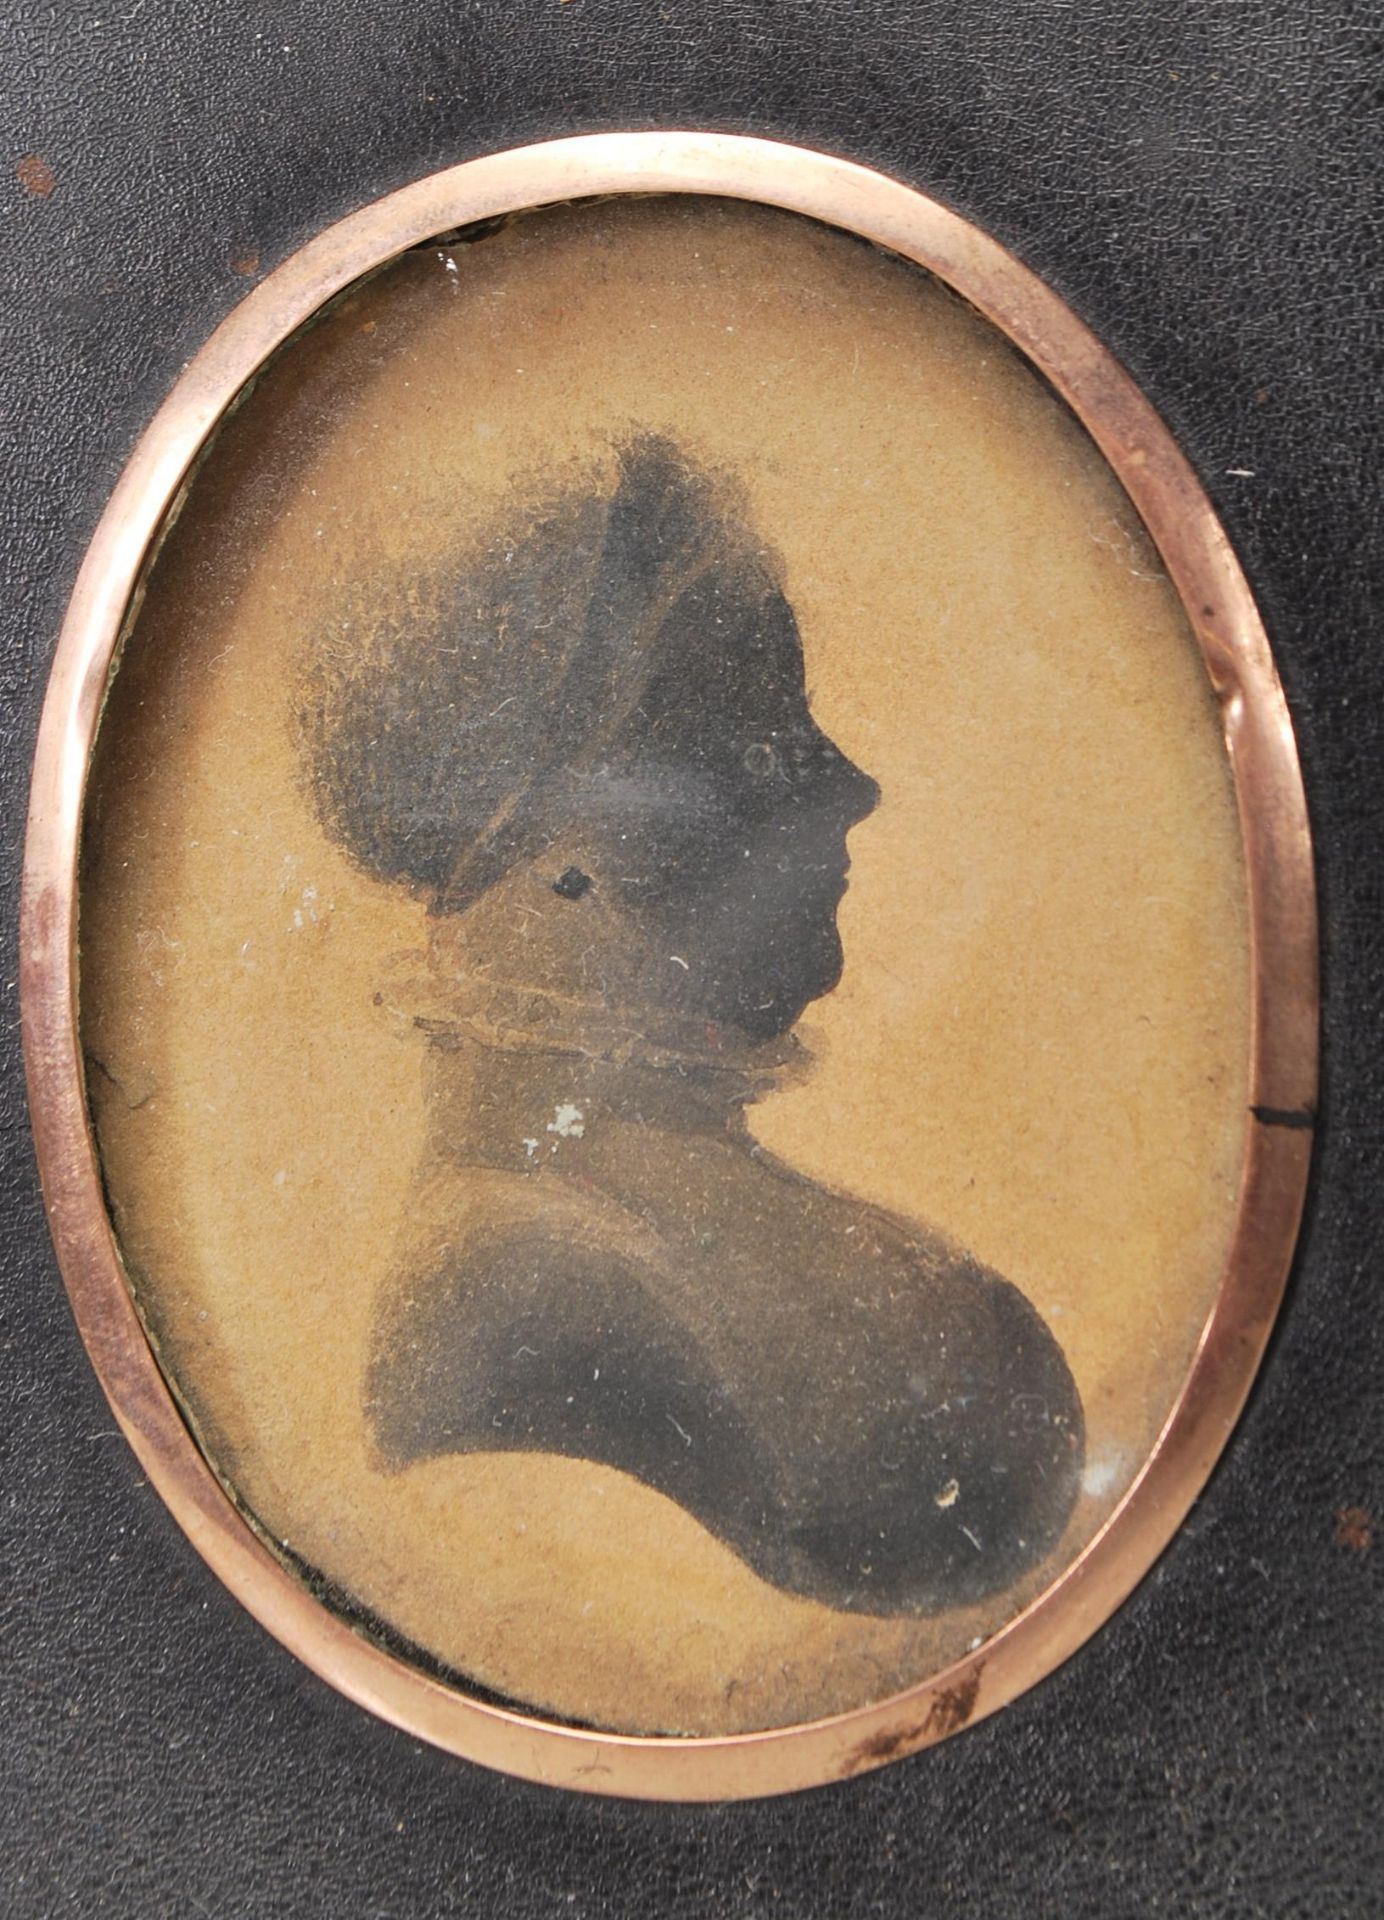 PAIR OF VICTORIAN 19TH CENTURY SIDE PORTRAITS / PORTRAIT MINIATURE - Image 2 of 4